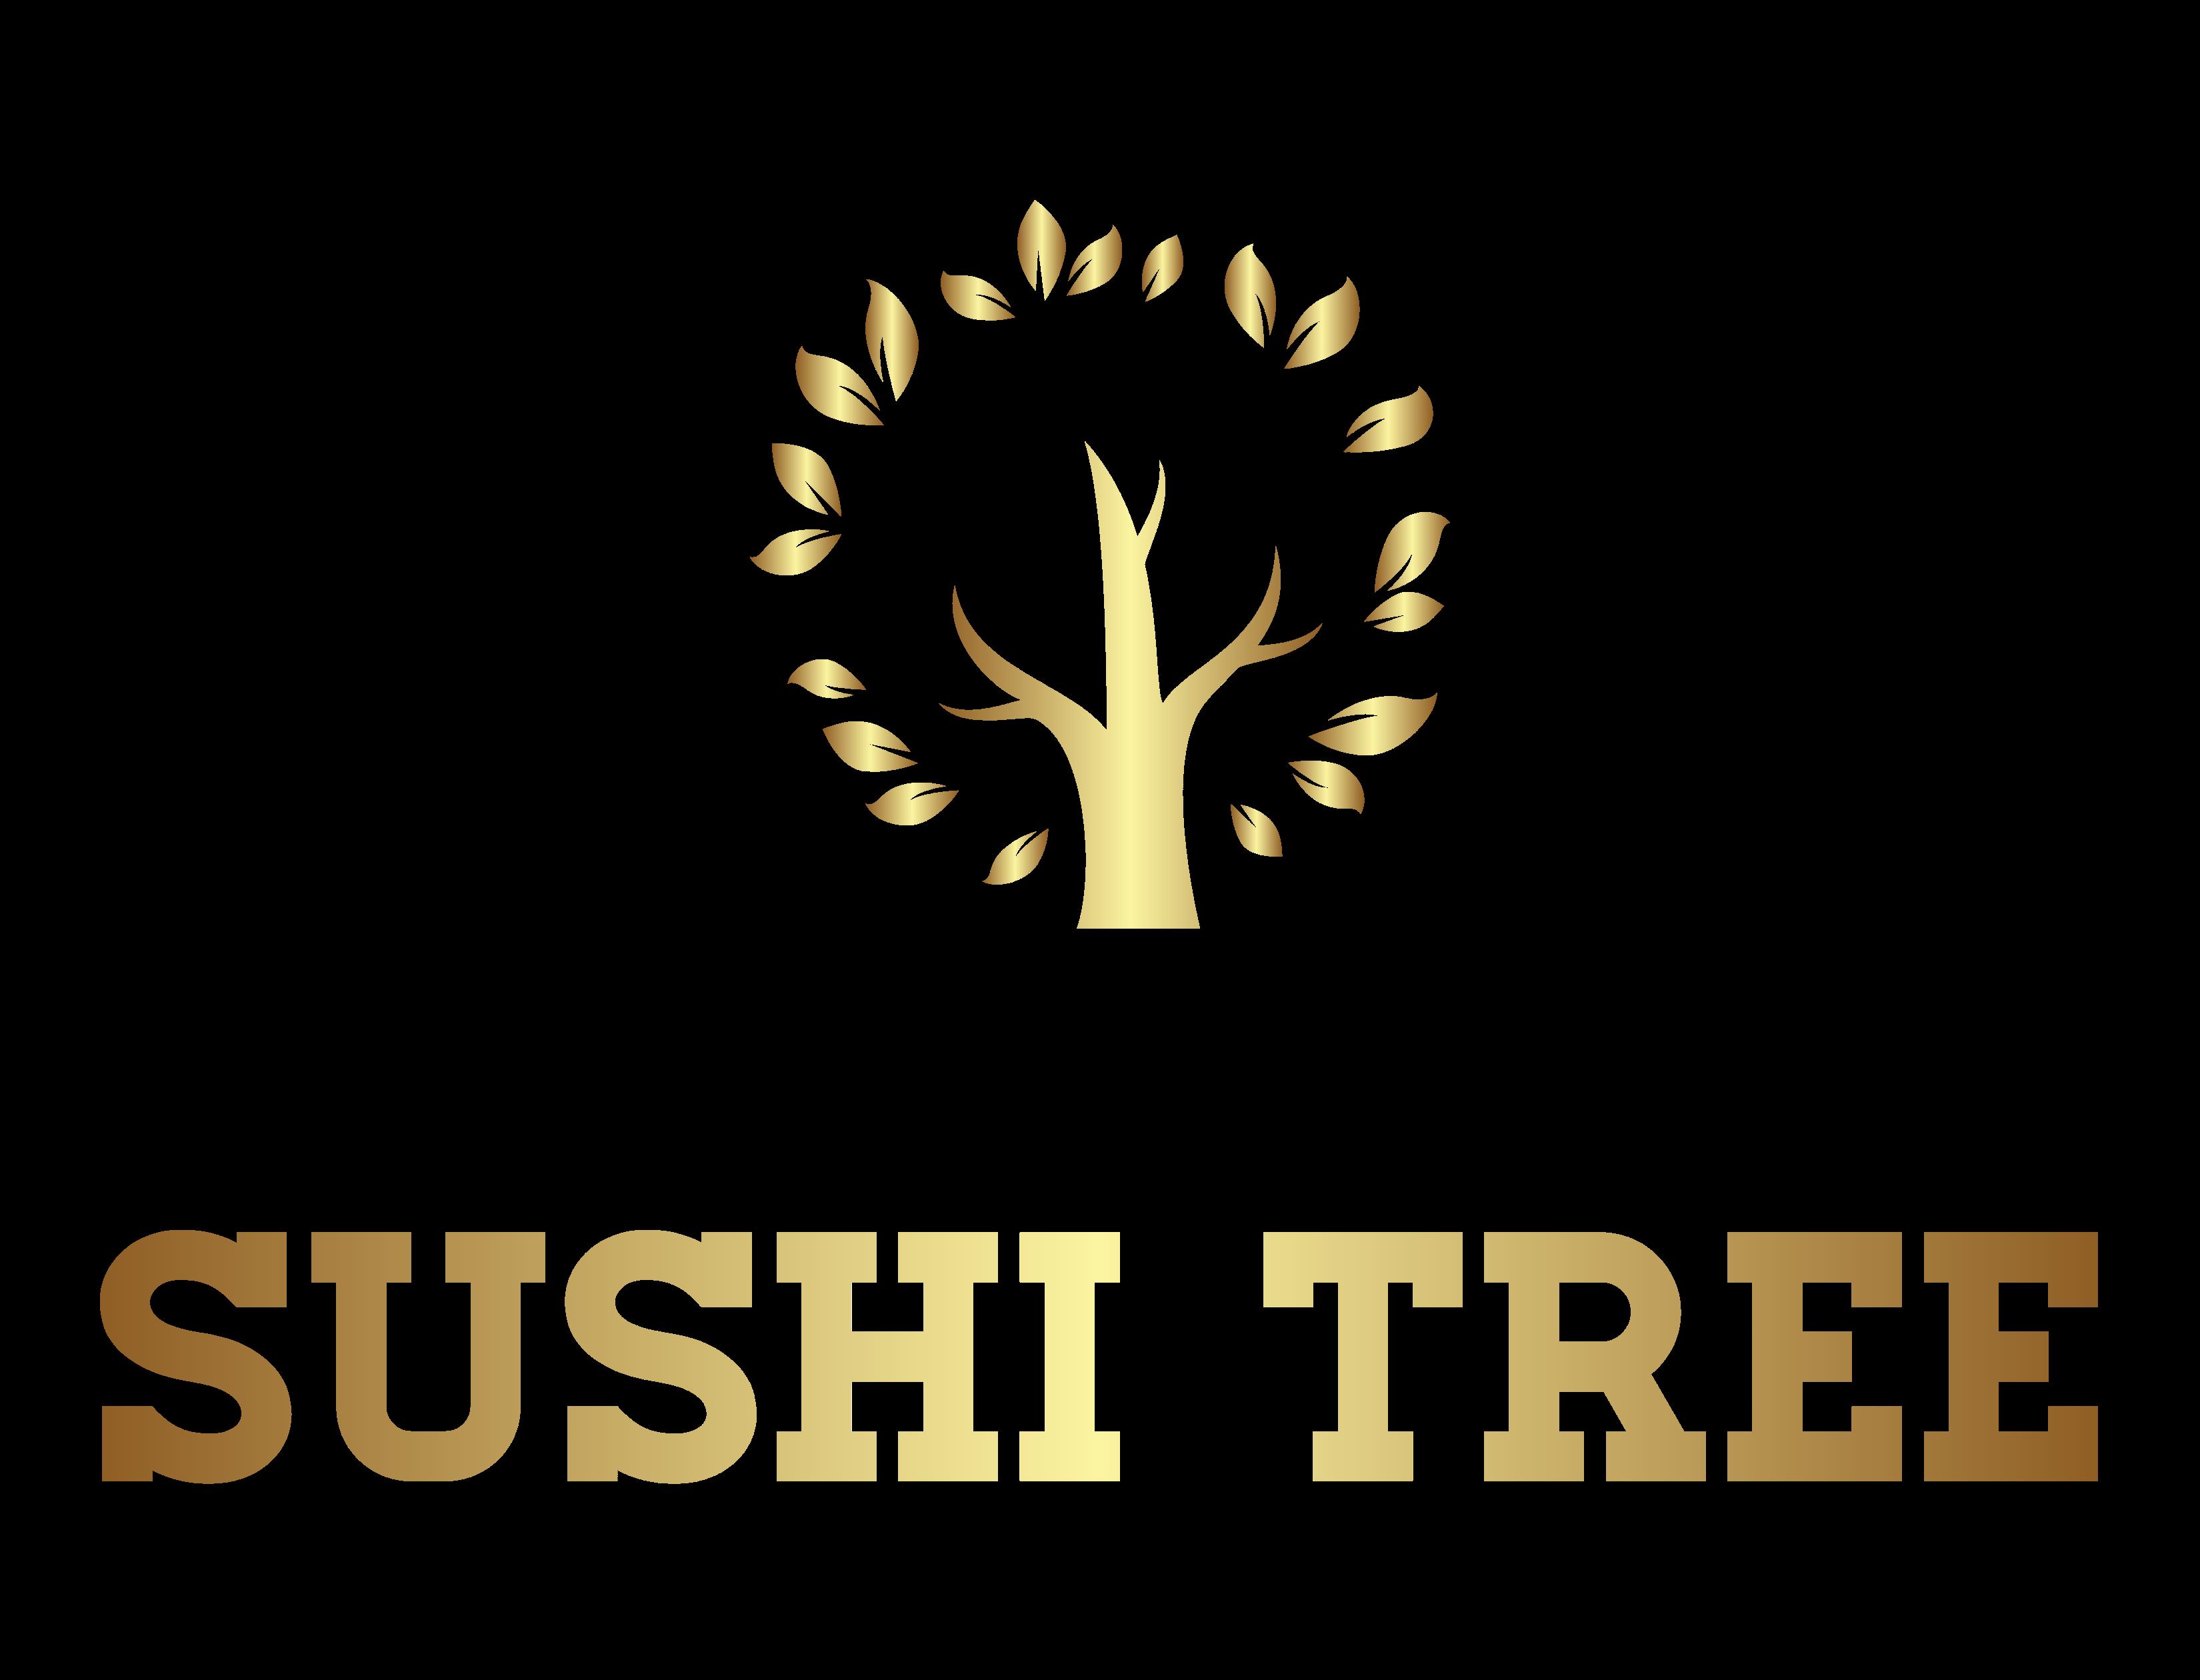 Sushi tree restaurant